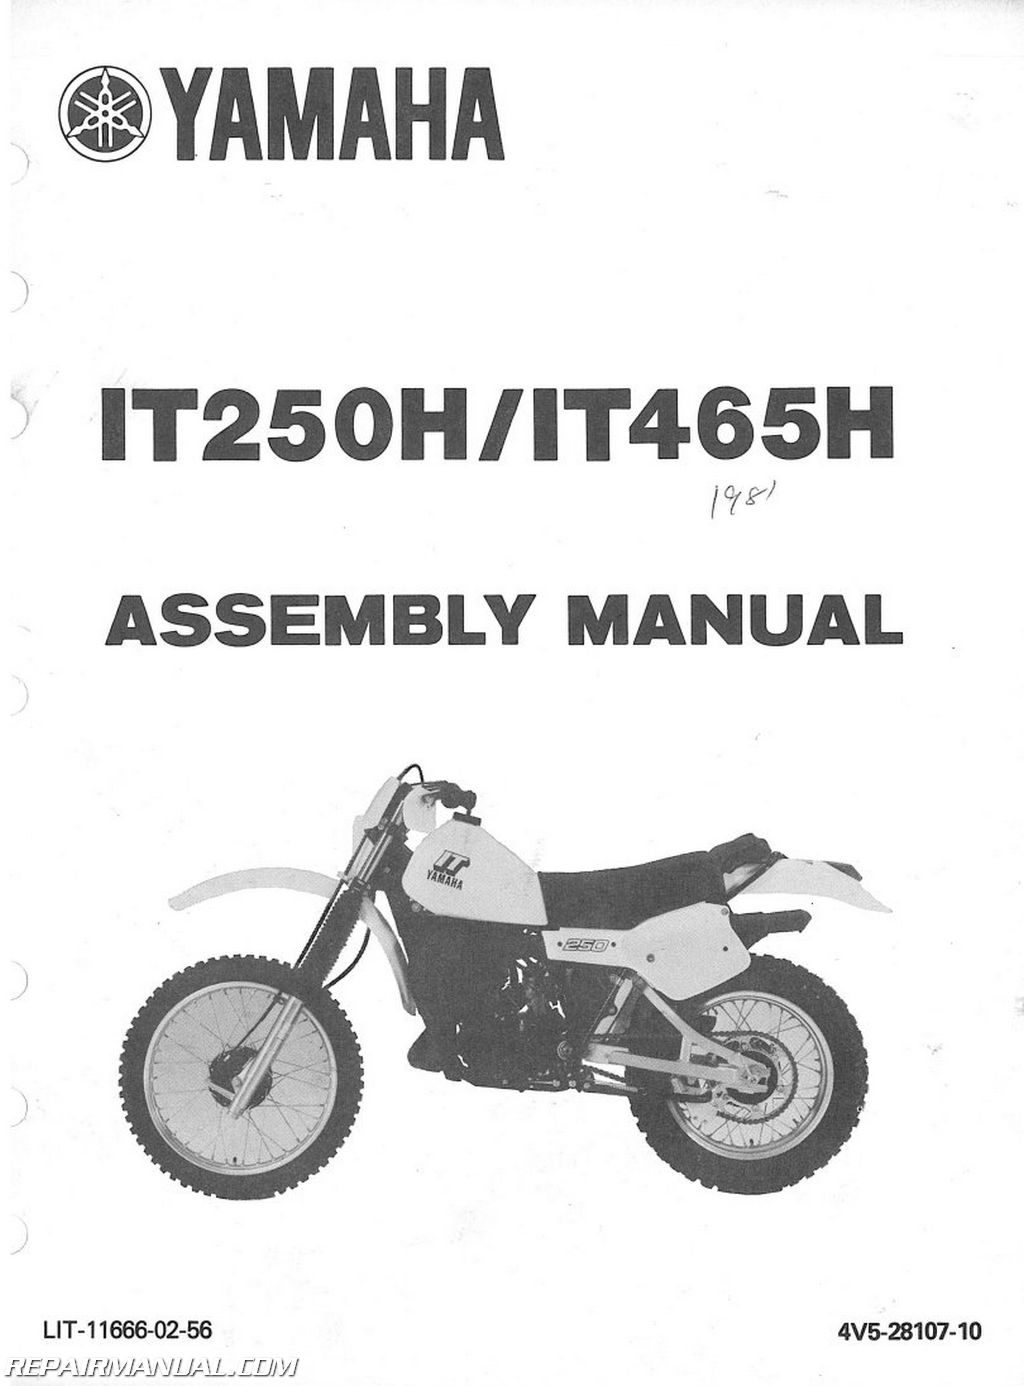 genuine yamaha service manual fj 11001200 l b fj1200bbc motorcycle repair manual lit 11616 fj 00 fj1200b fj1200bc supplementary service manual